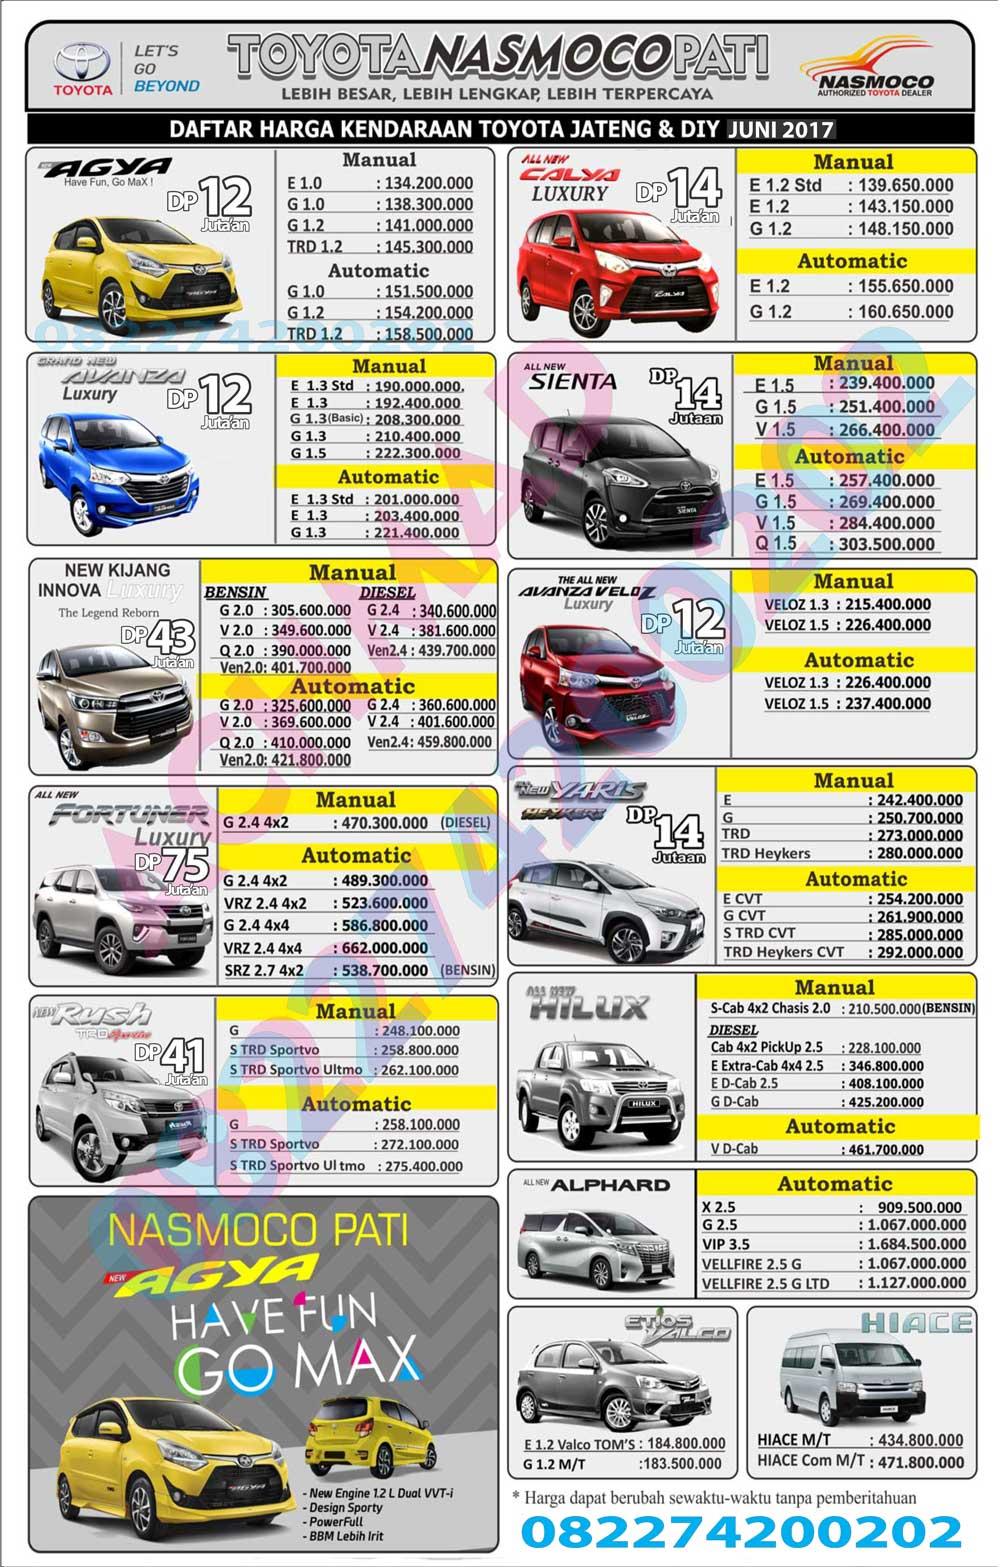 Kekurangan Harga Toyota Tangguh